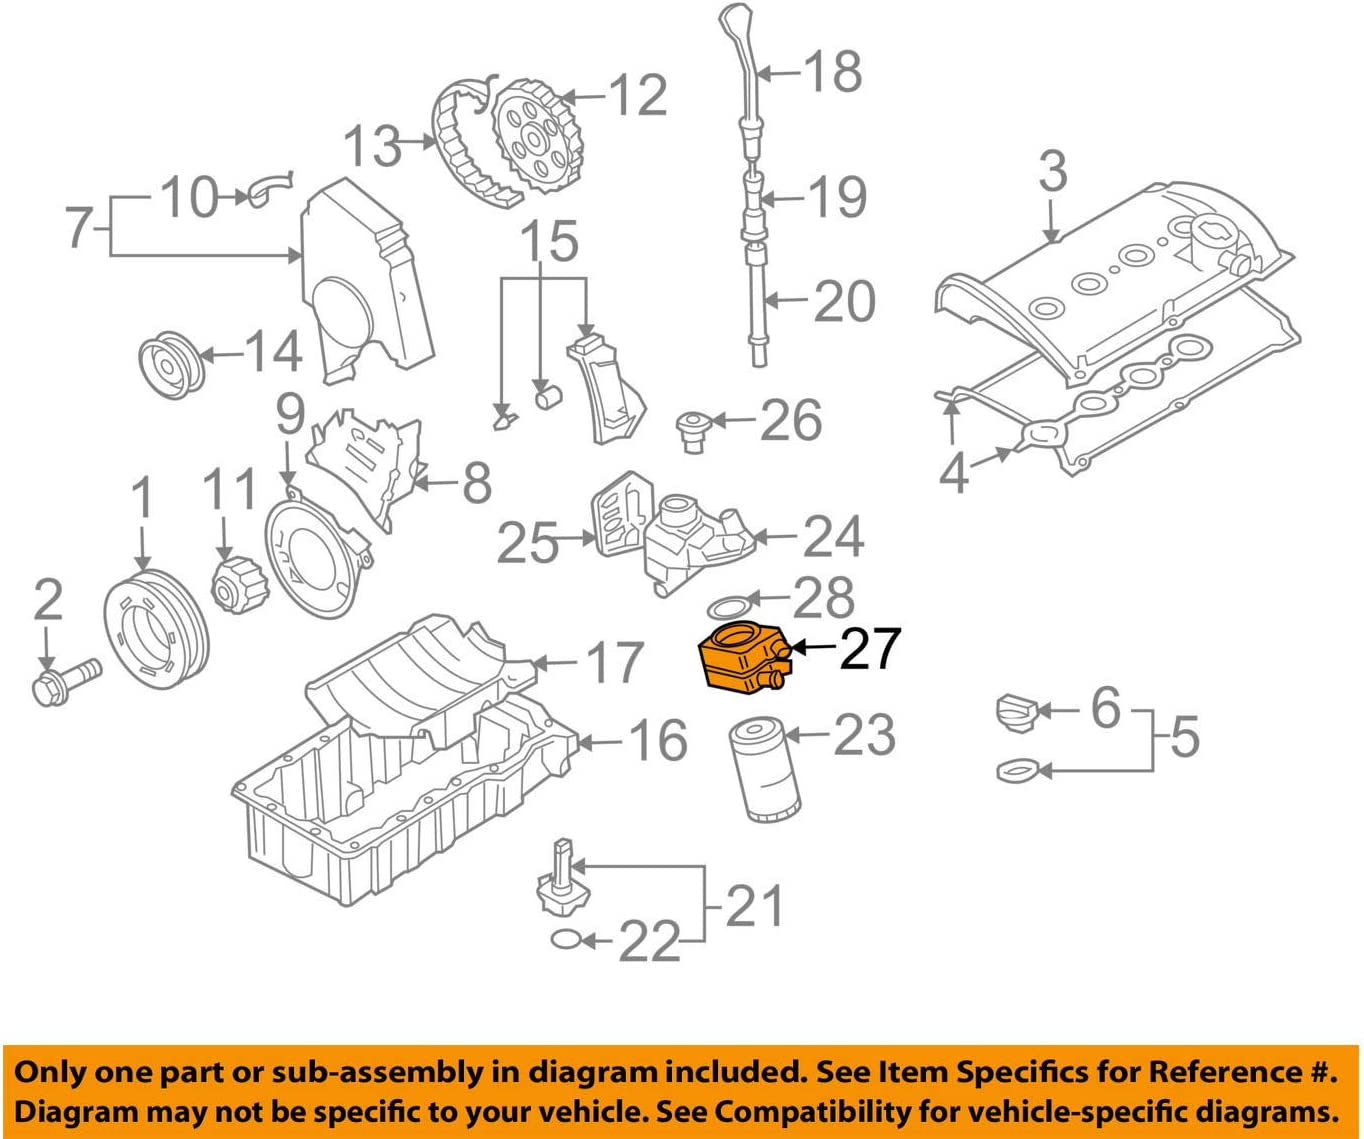 Amazon.com: 028-117-021-L Volkswagen 1.8T and 2.0 Oil Cooler: AutomotiveAmazon.com